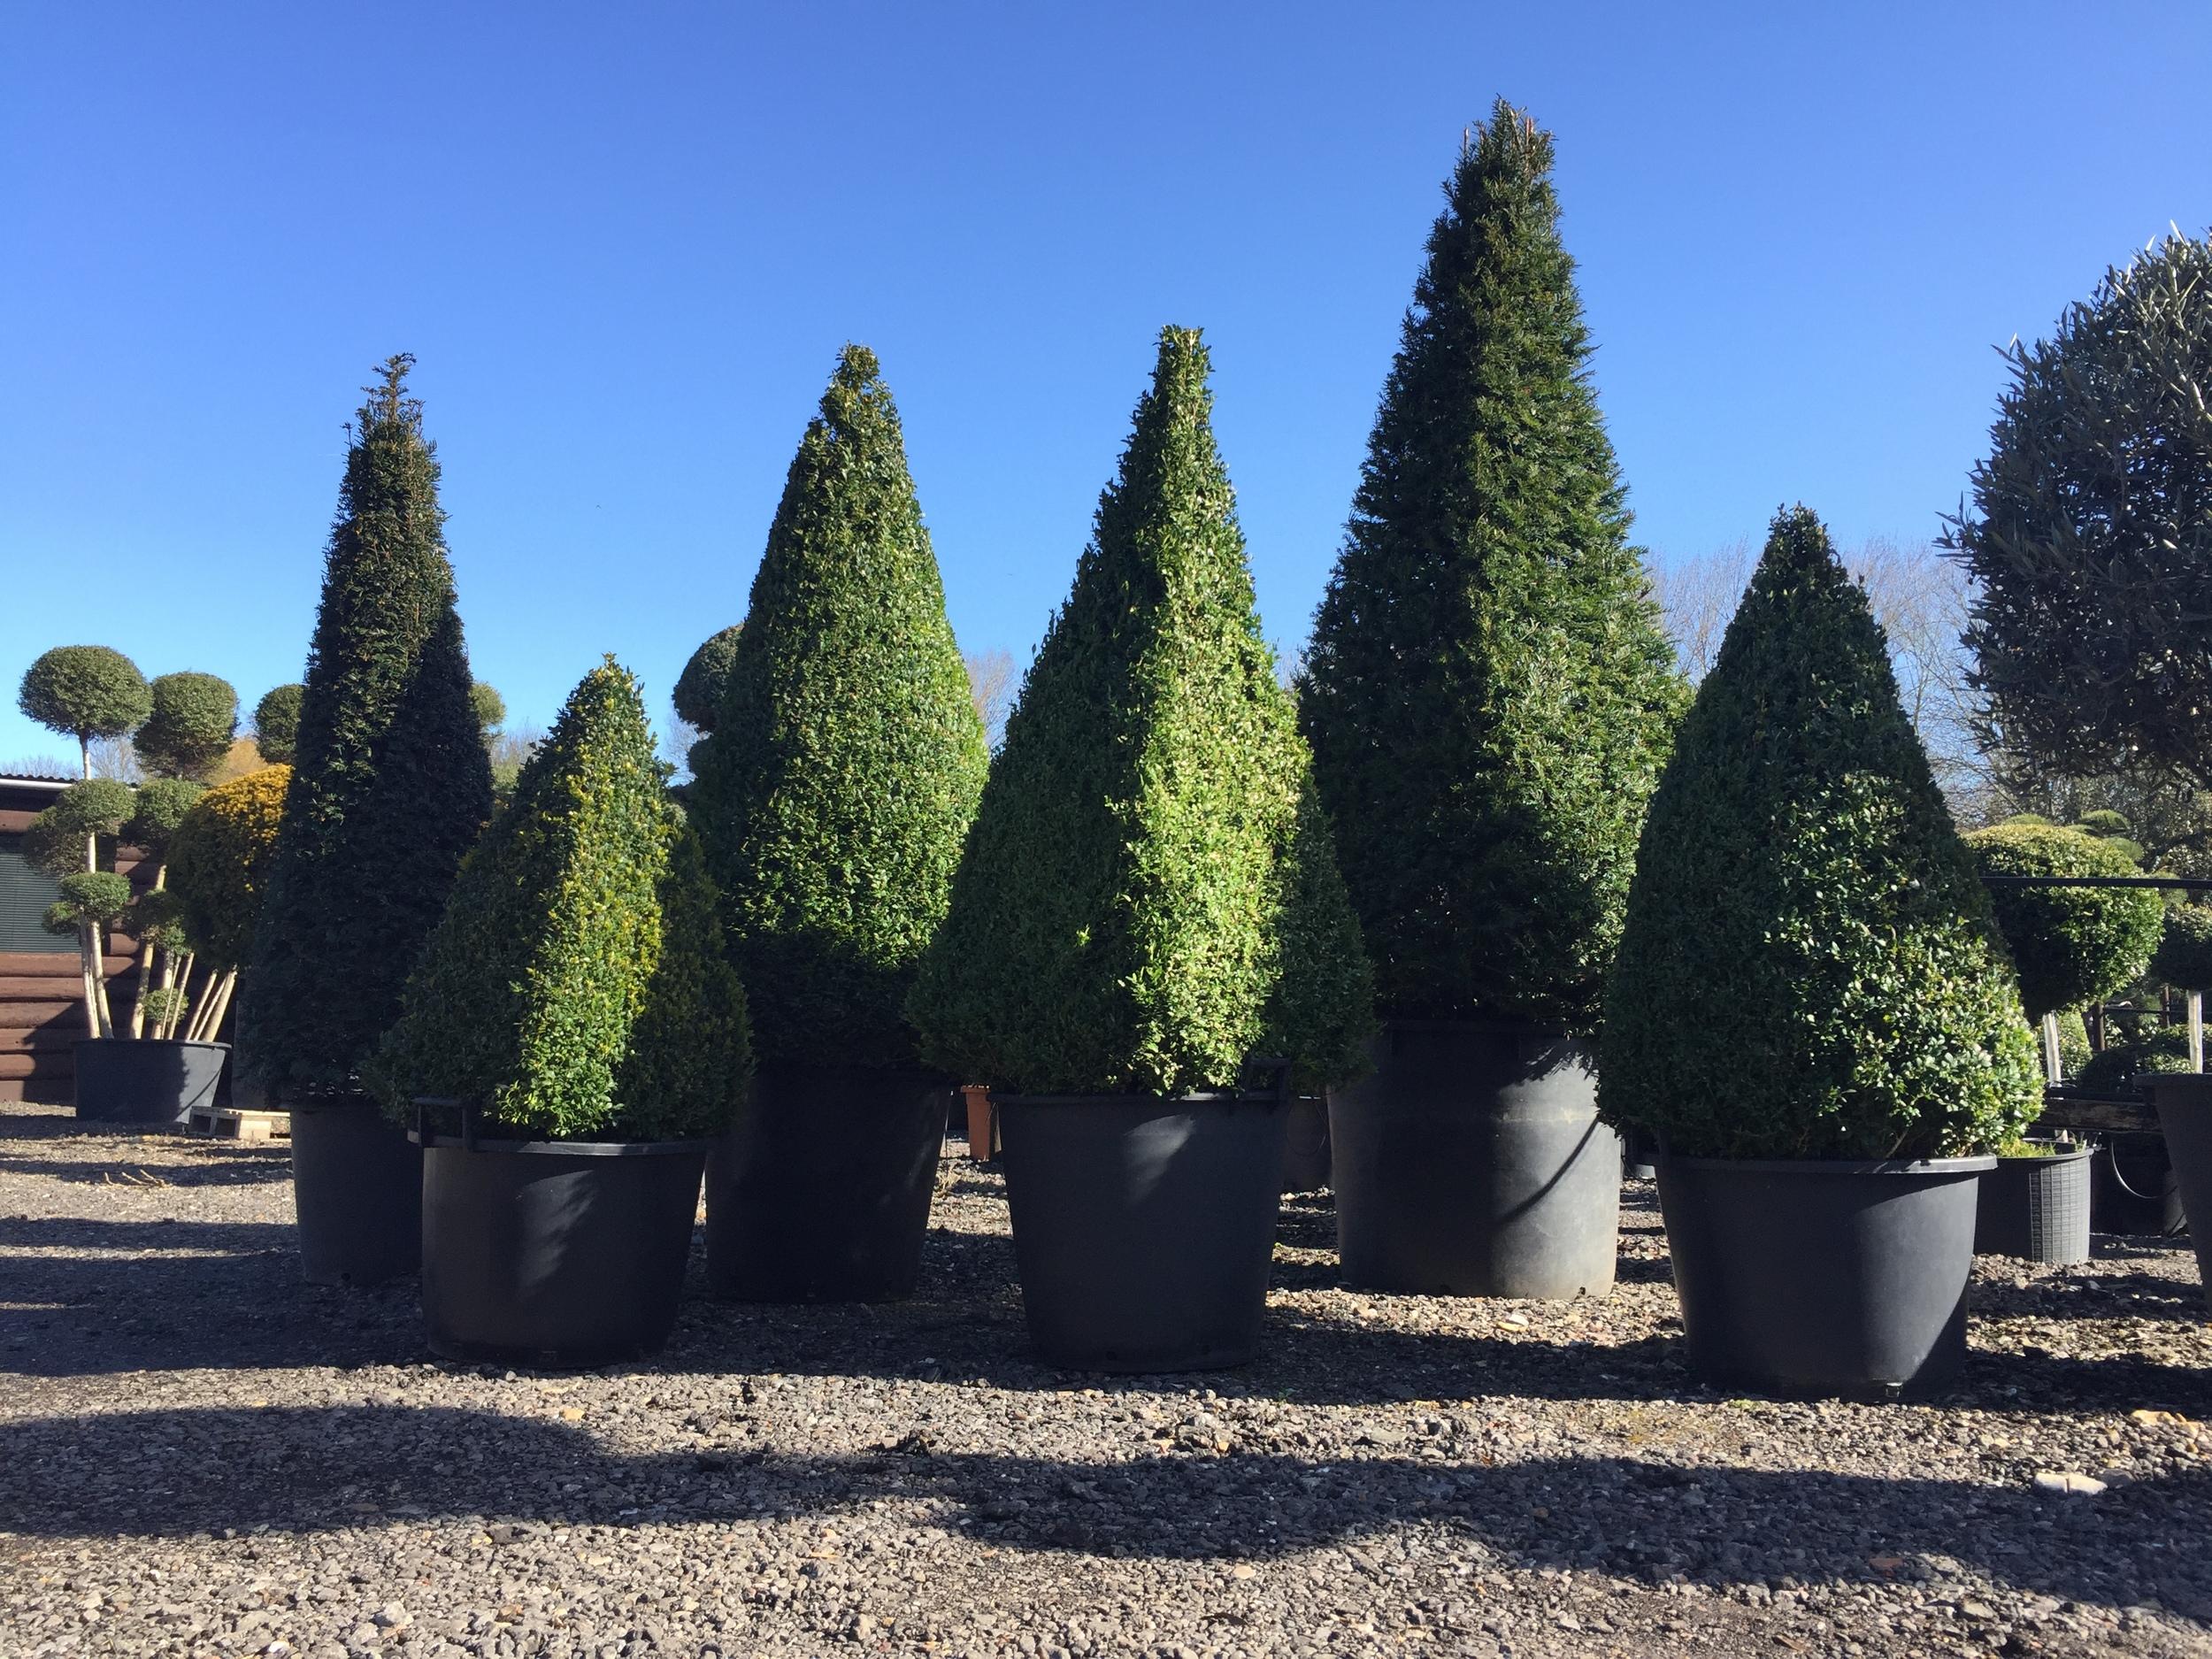 Box & Yew cones & pyramids